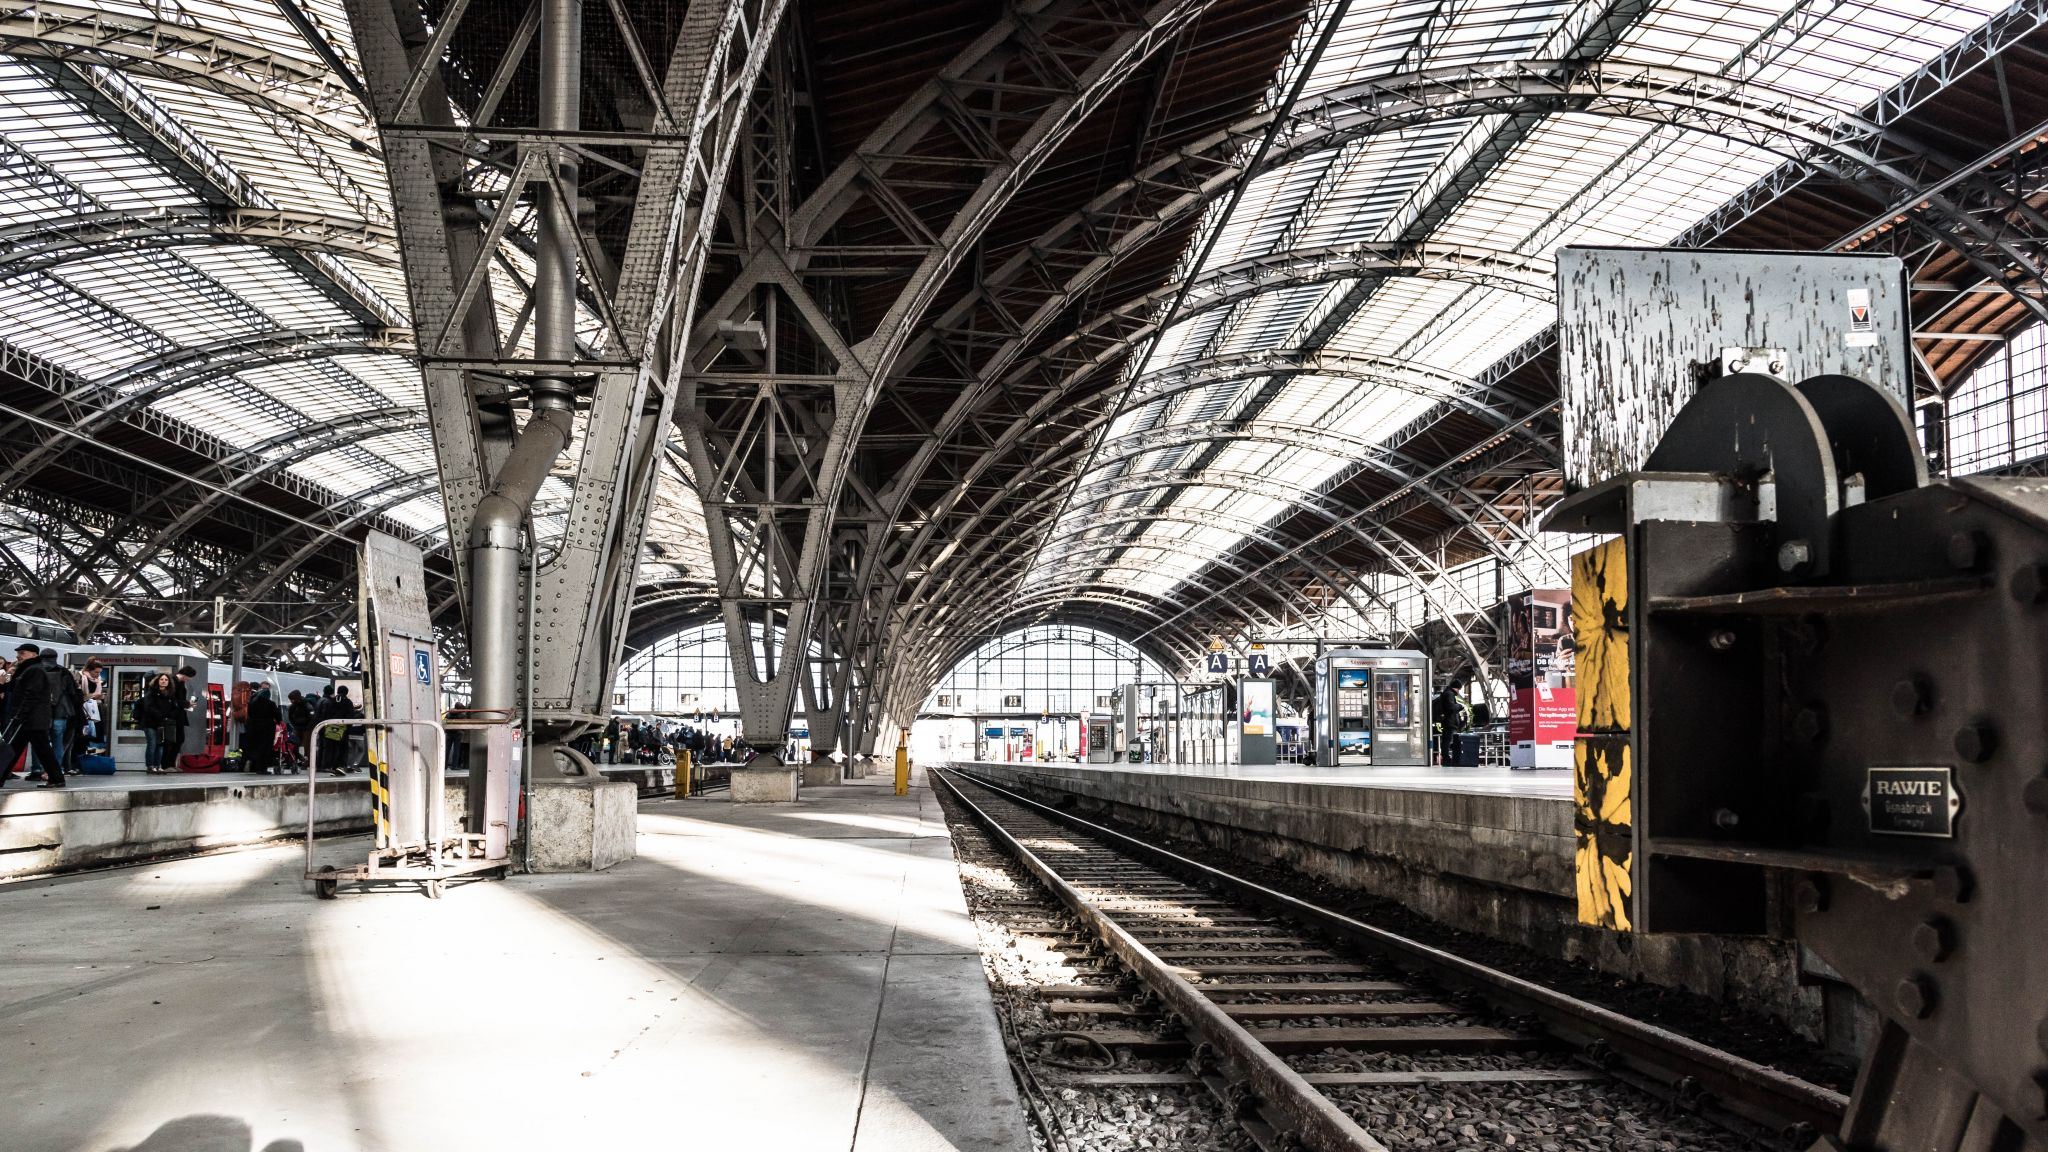 Leipzig Mainstation / Hauptbahnhof, Germany